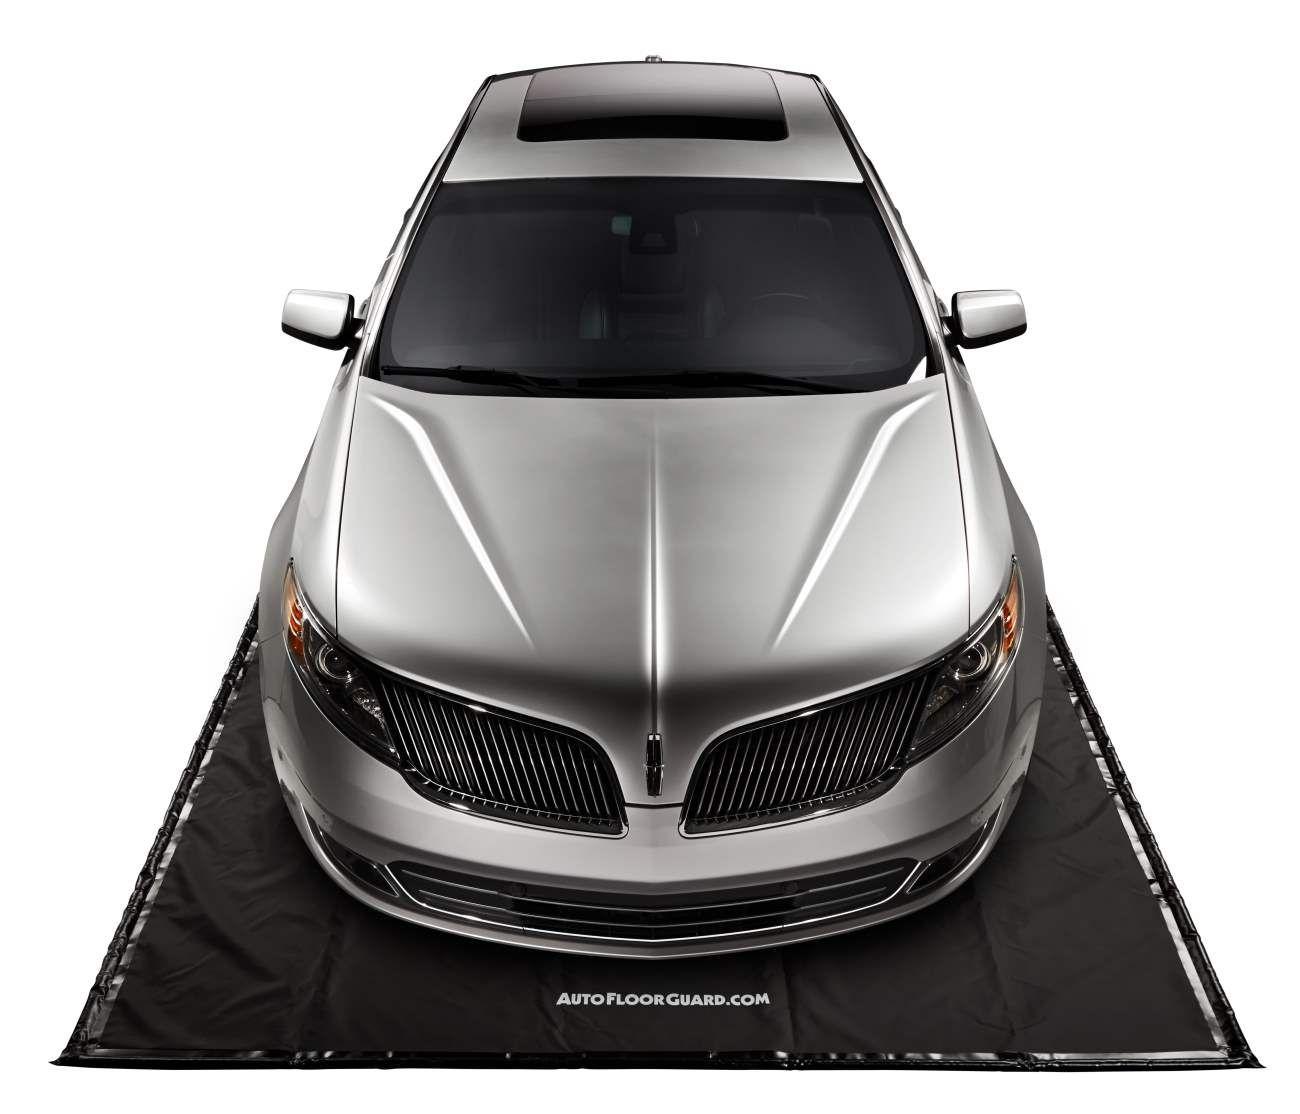 Premium Auto Floor Guard Mid size car, Garage mats, Vehicles